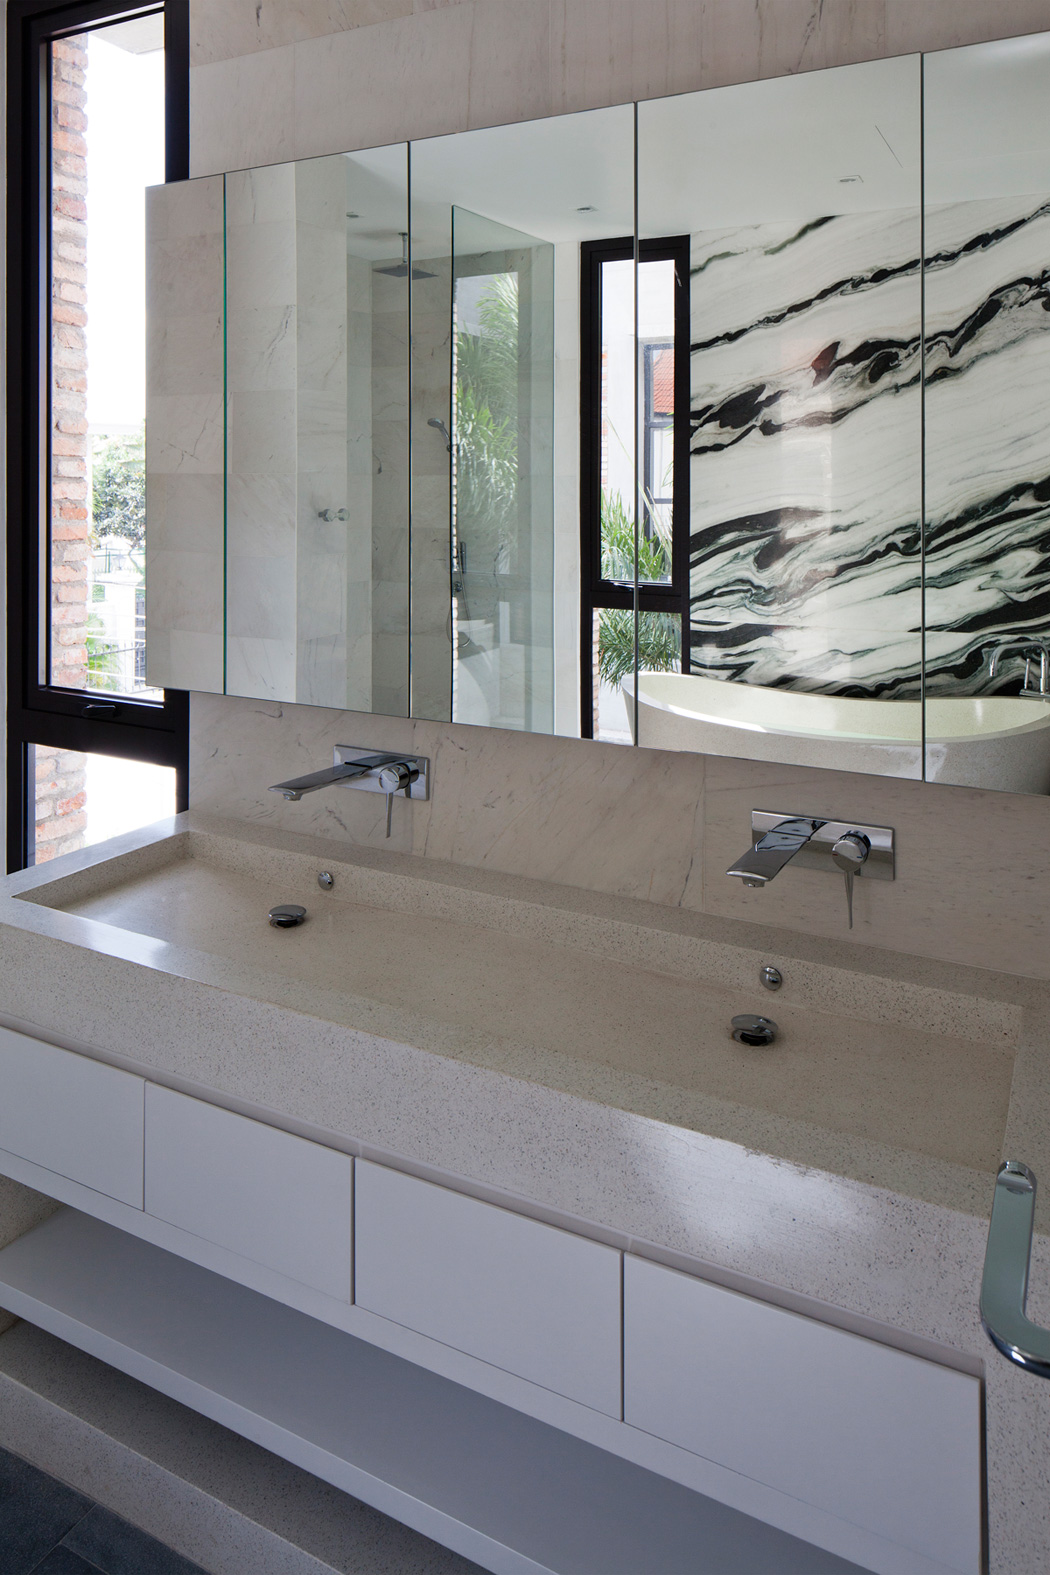 Private Villa Renovation by MM ++ Architects (21)